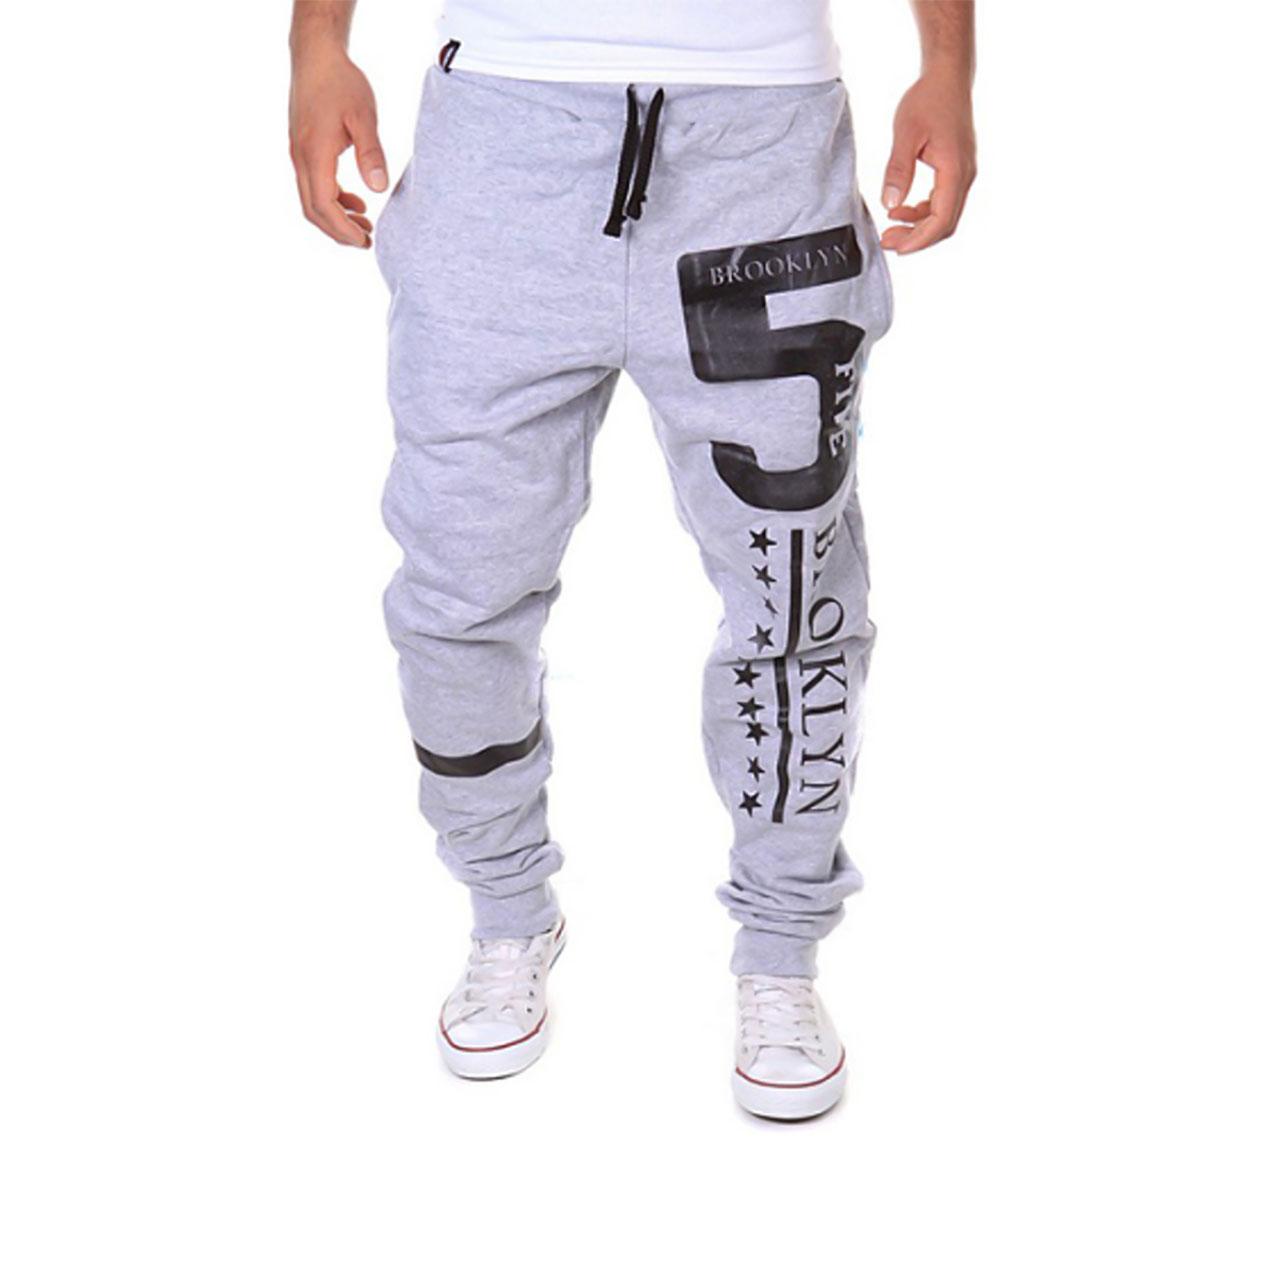 Men's Active / Basic Casual USA Loose Gray WFH Sweatpants